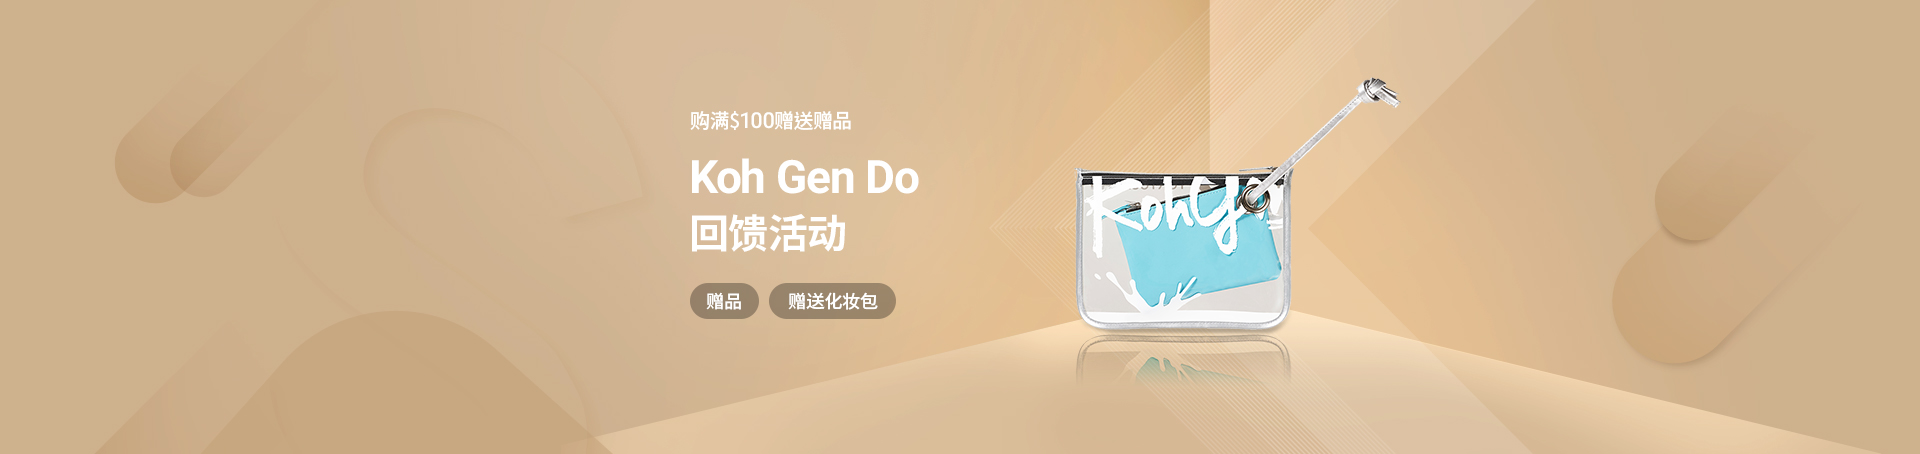 Koh Gen Do 回馈活动